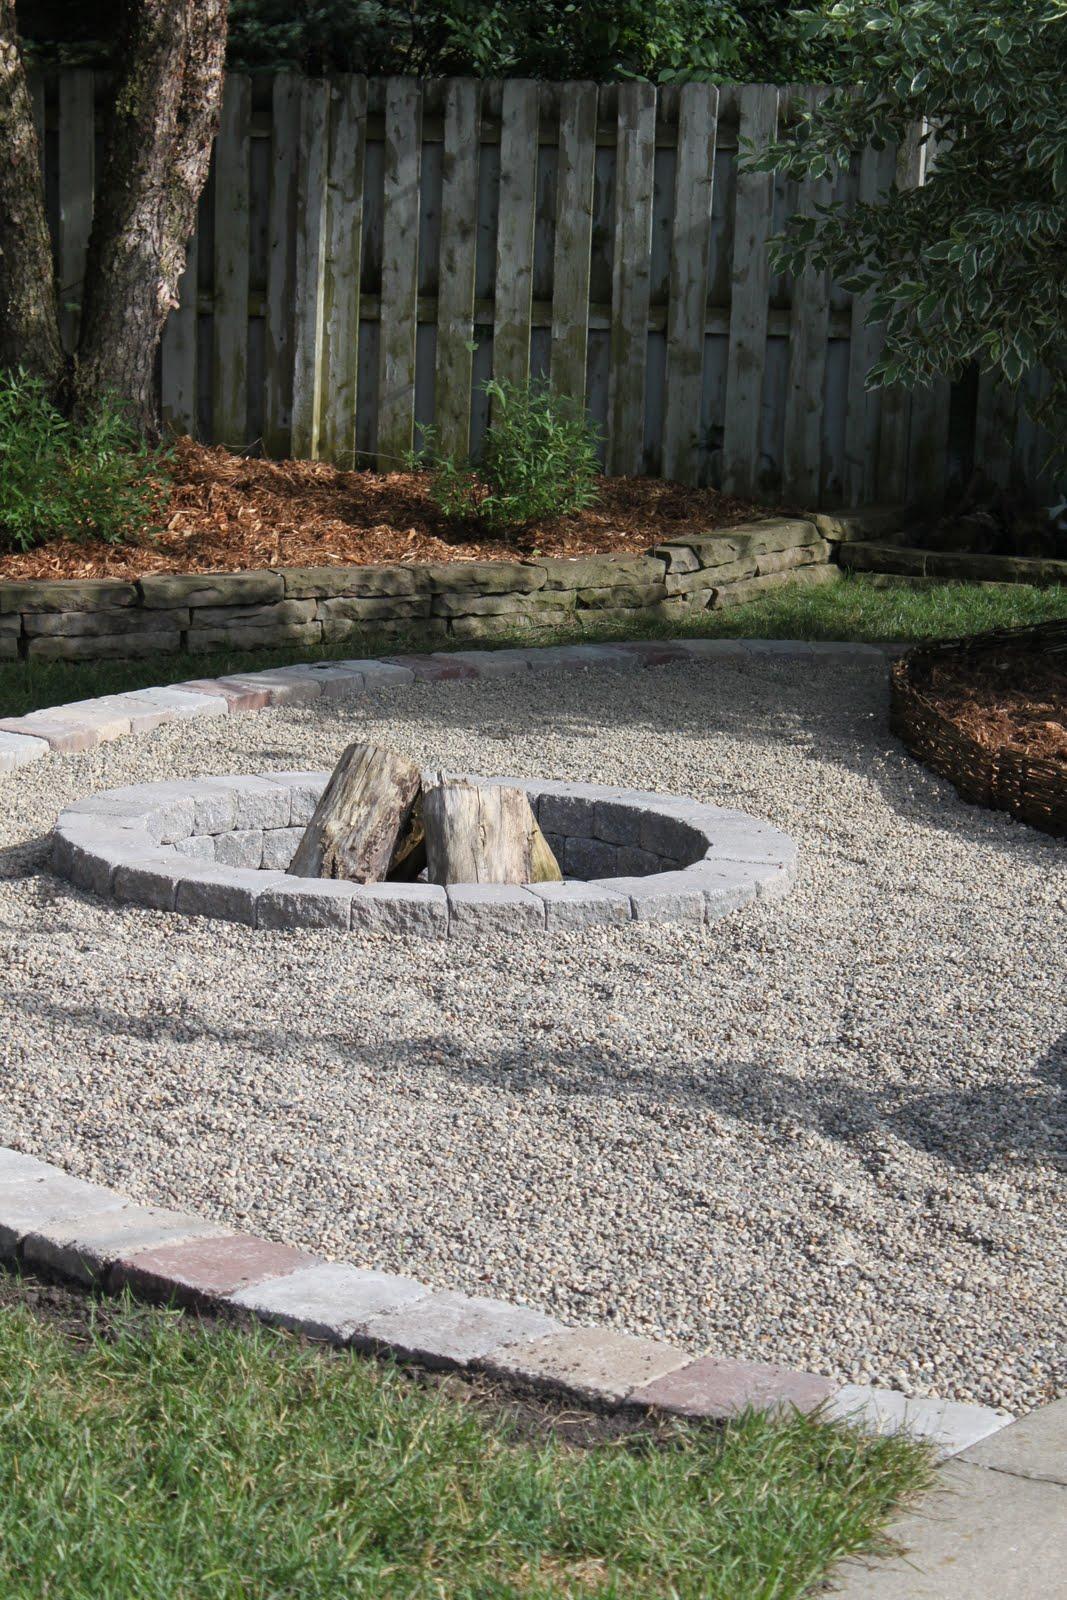 Best Stone For Steps: Happenstance Home